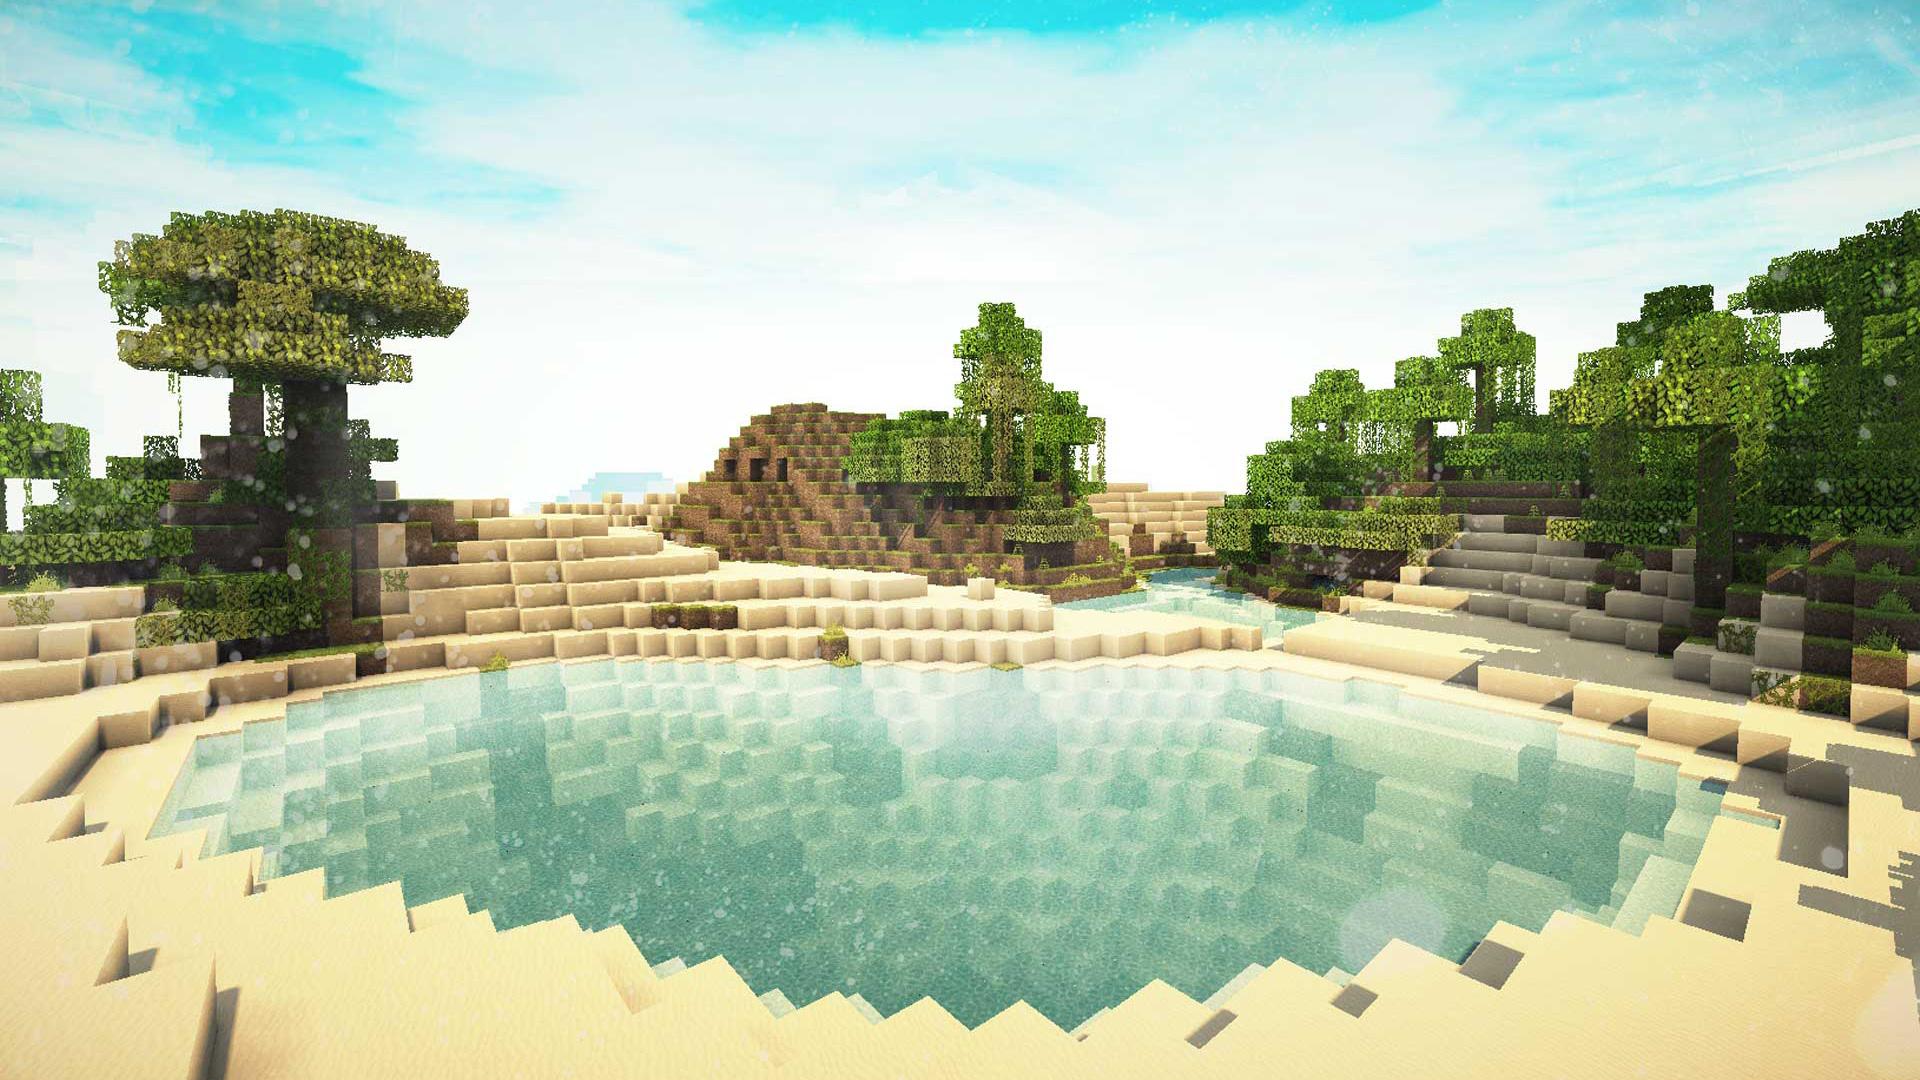 Minecraft Wallpaper 15